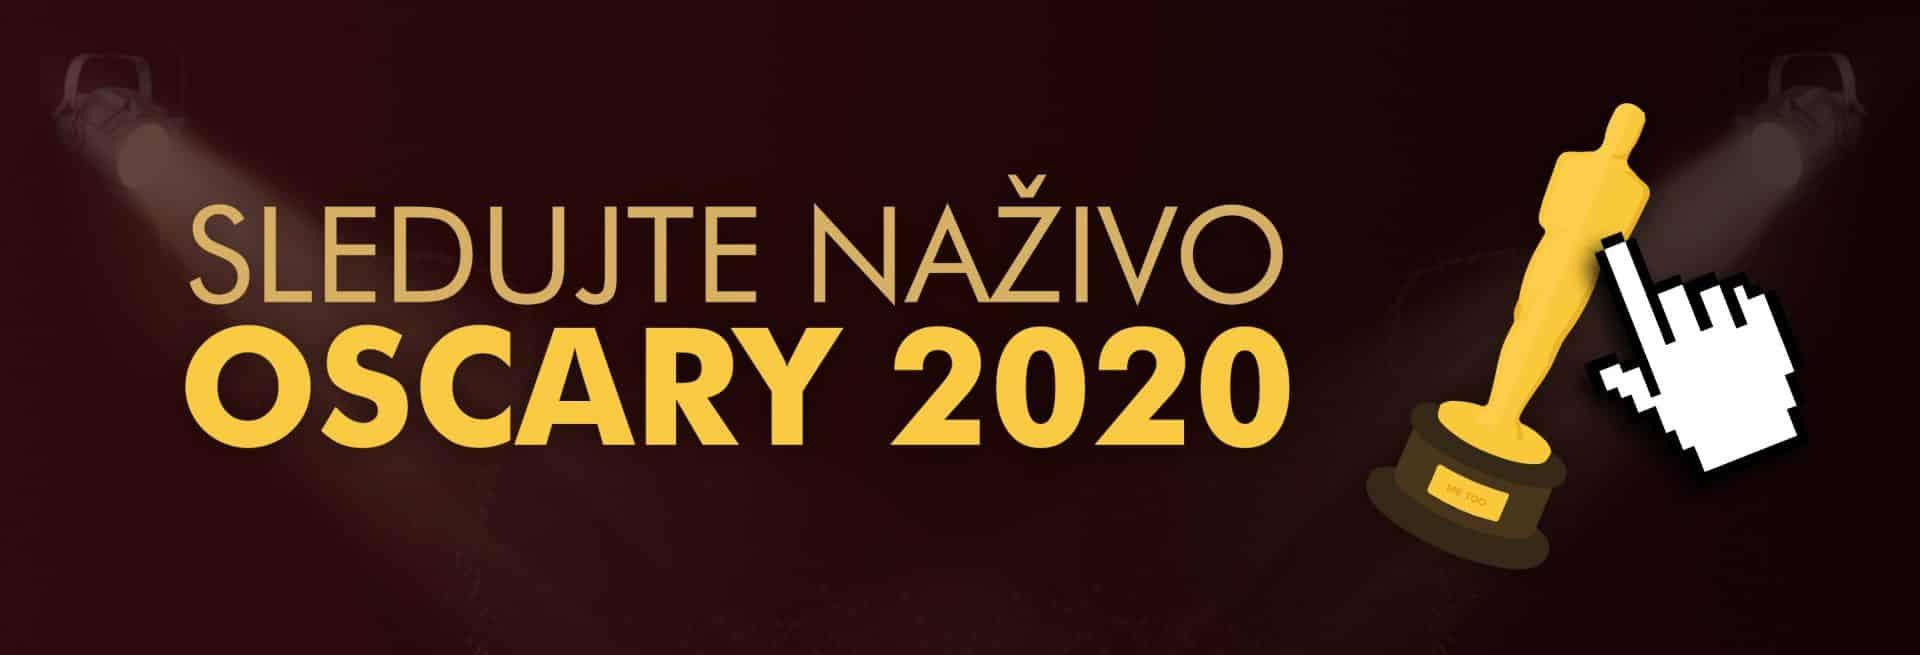 rewind_oscary2020-BANNER DO CLANKOV